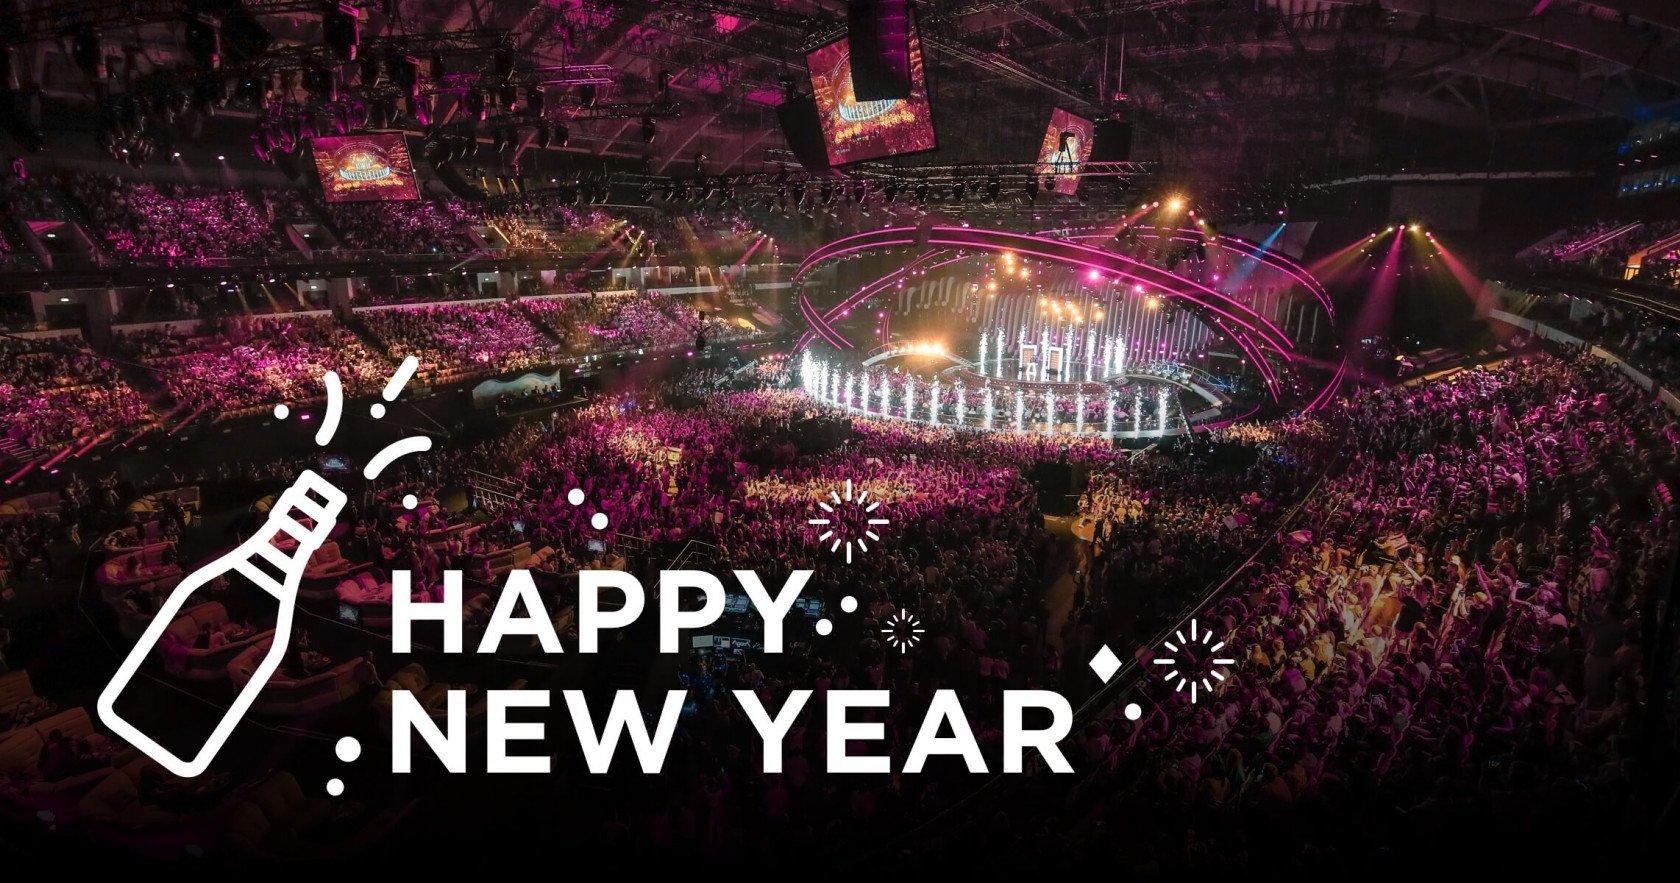 Beautiful Qoutes On Happy New Year